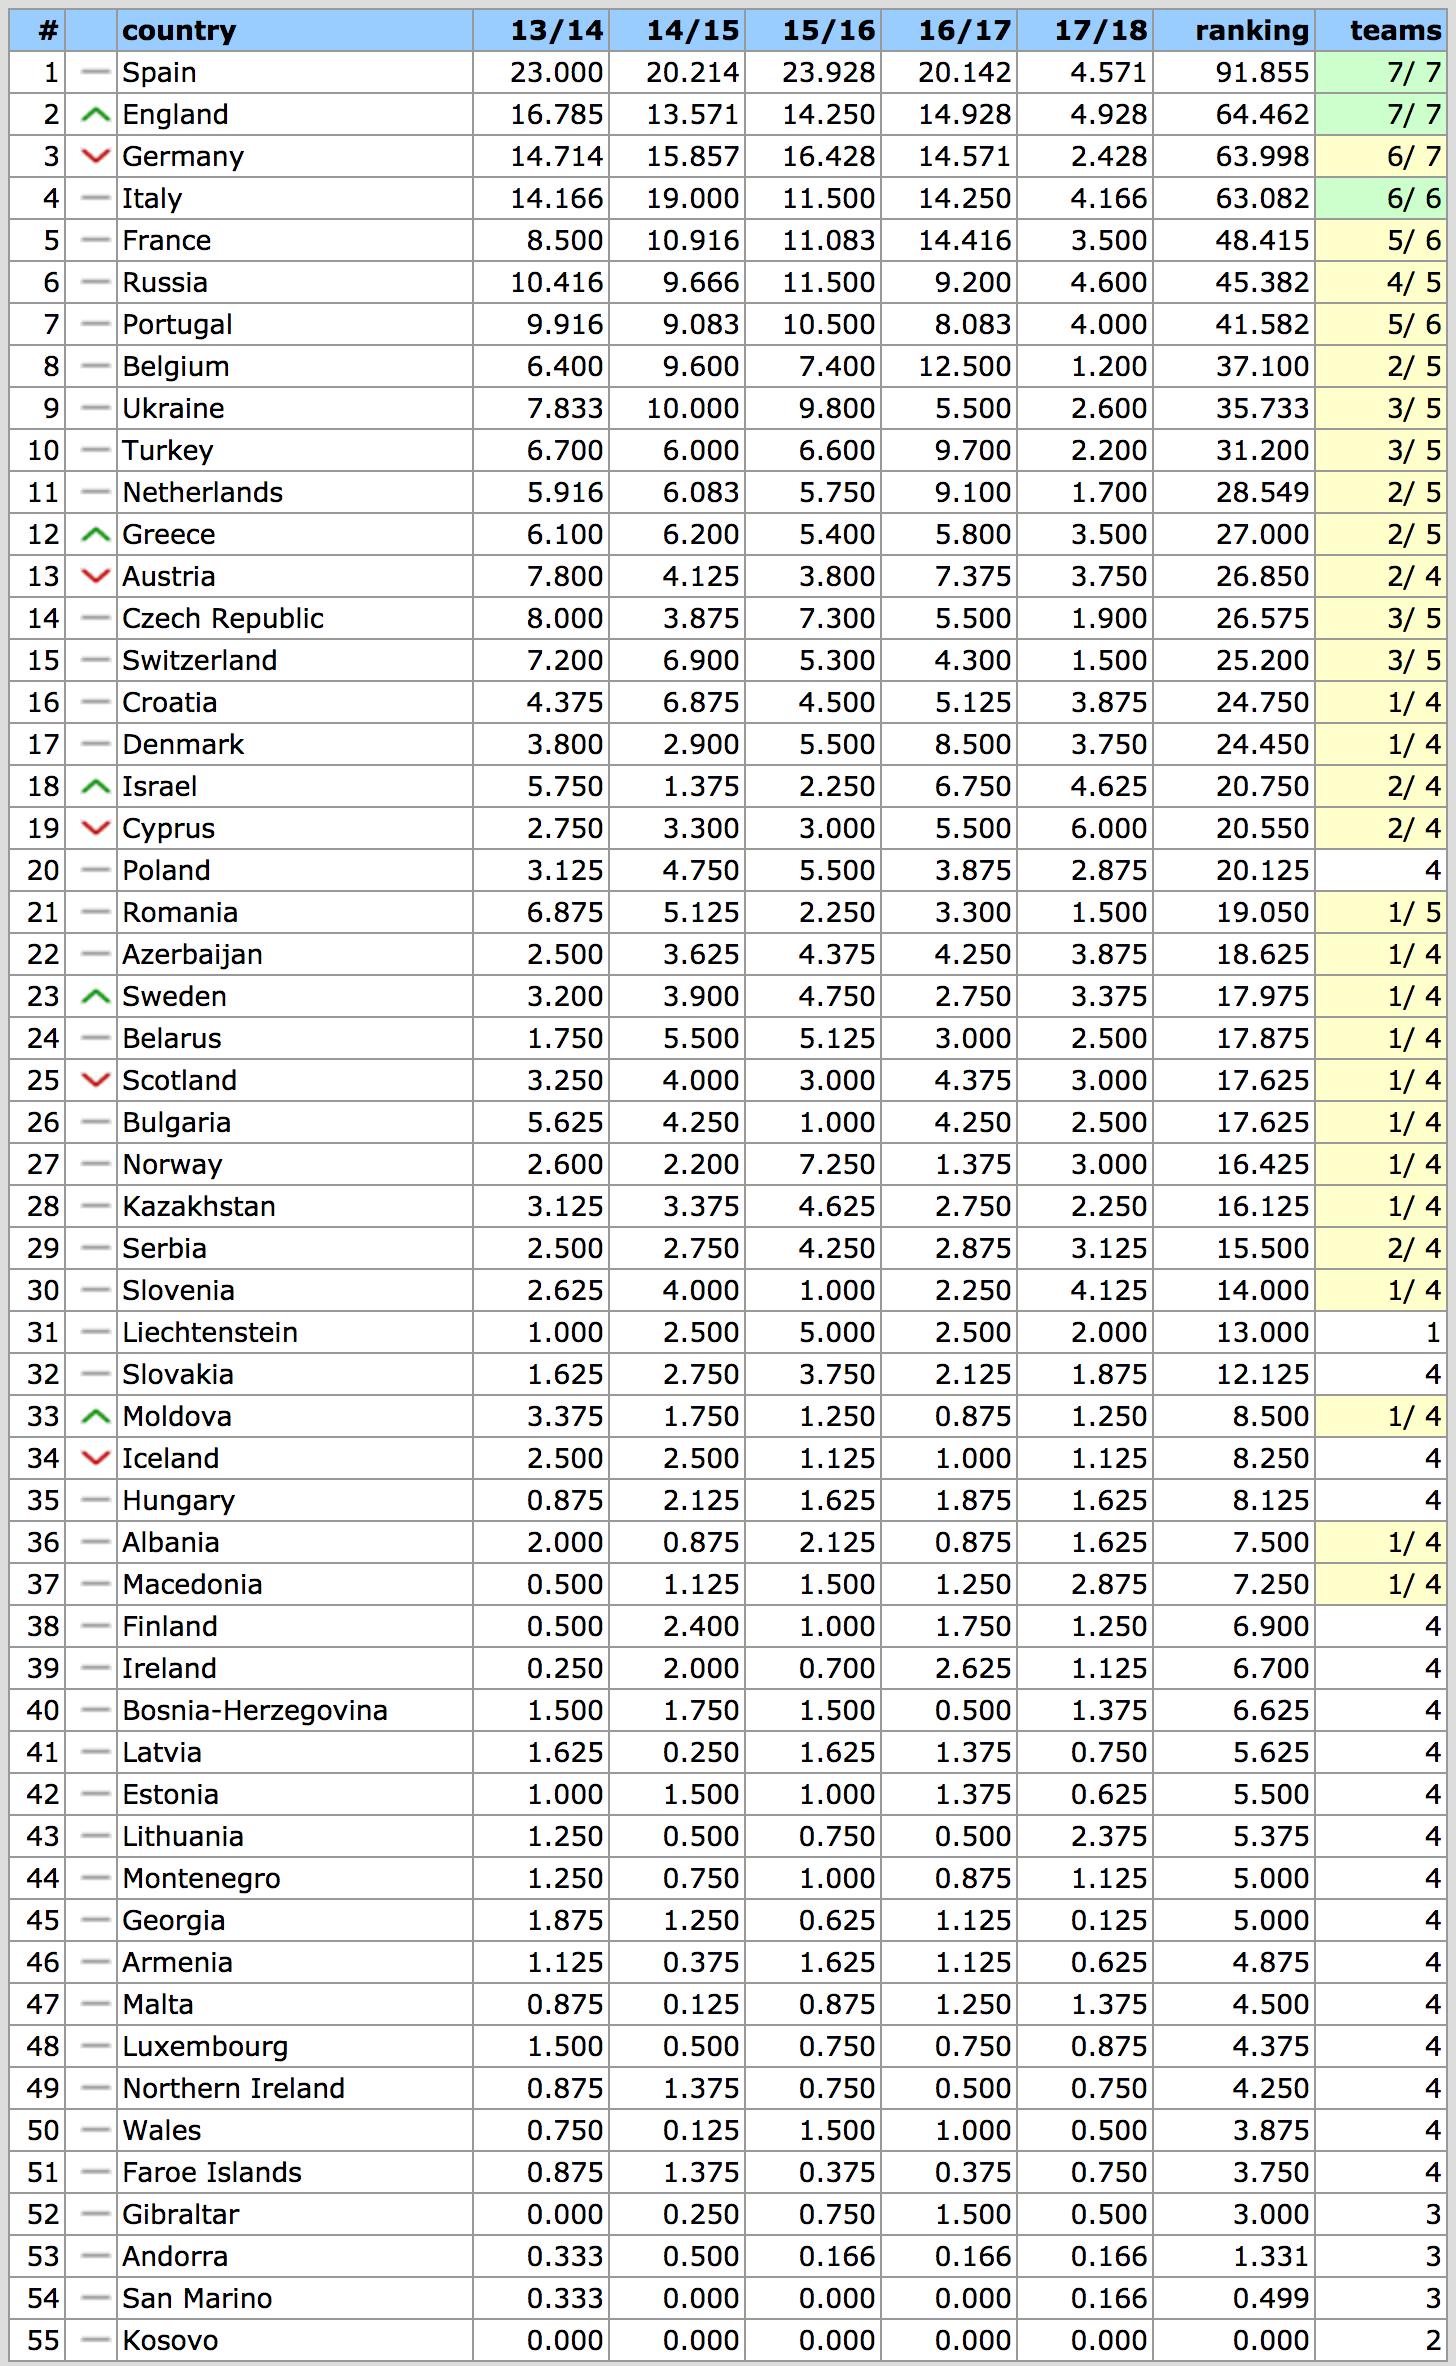 UEFA Country Ranking 2018 (2)